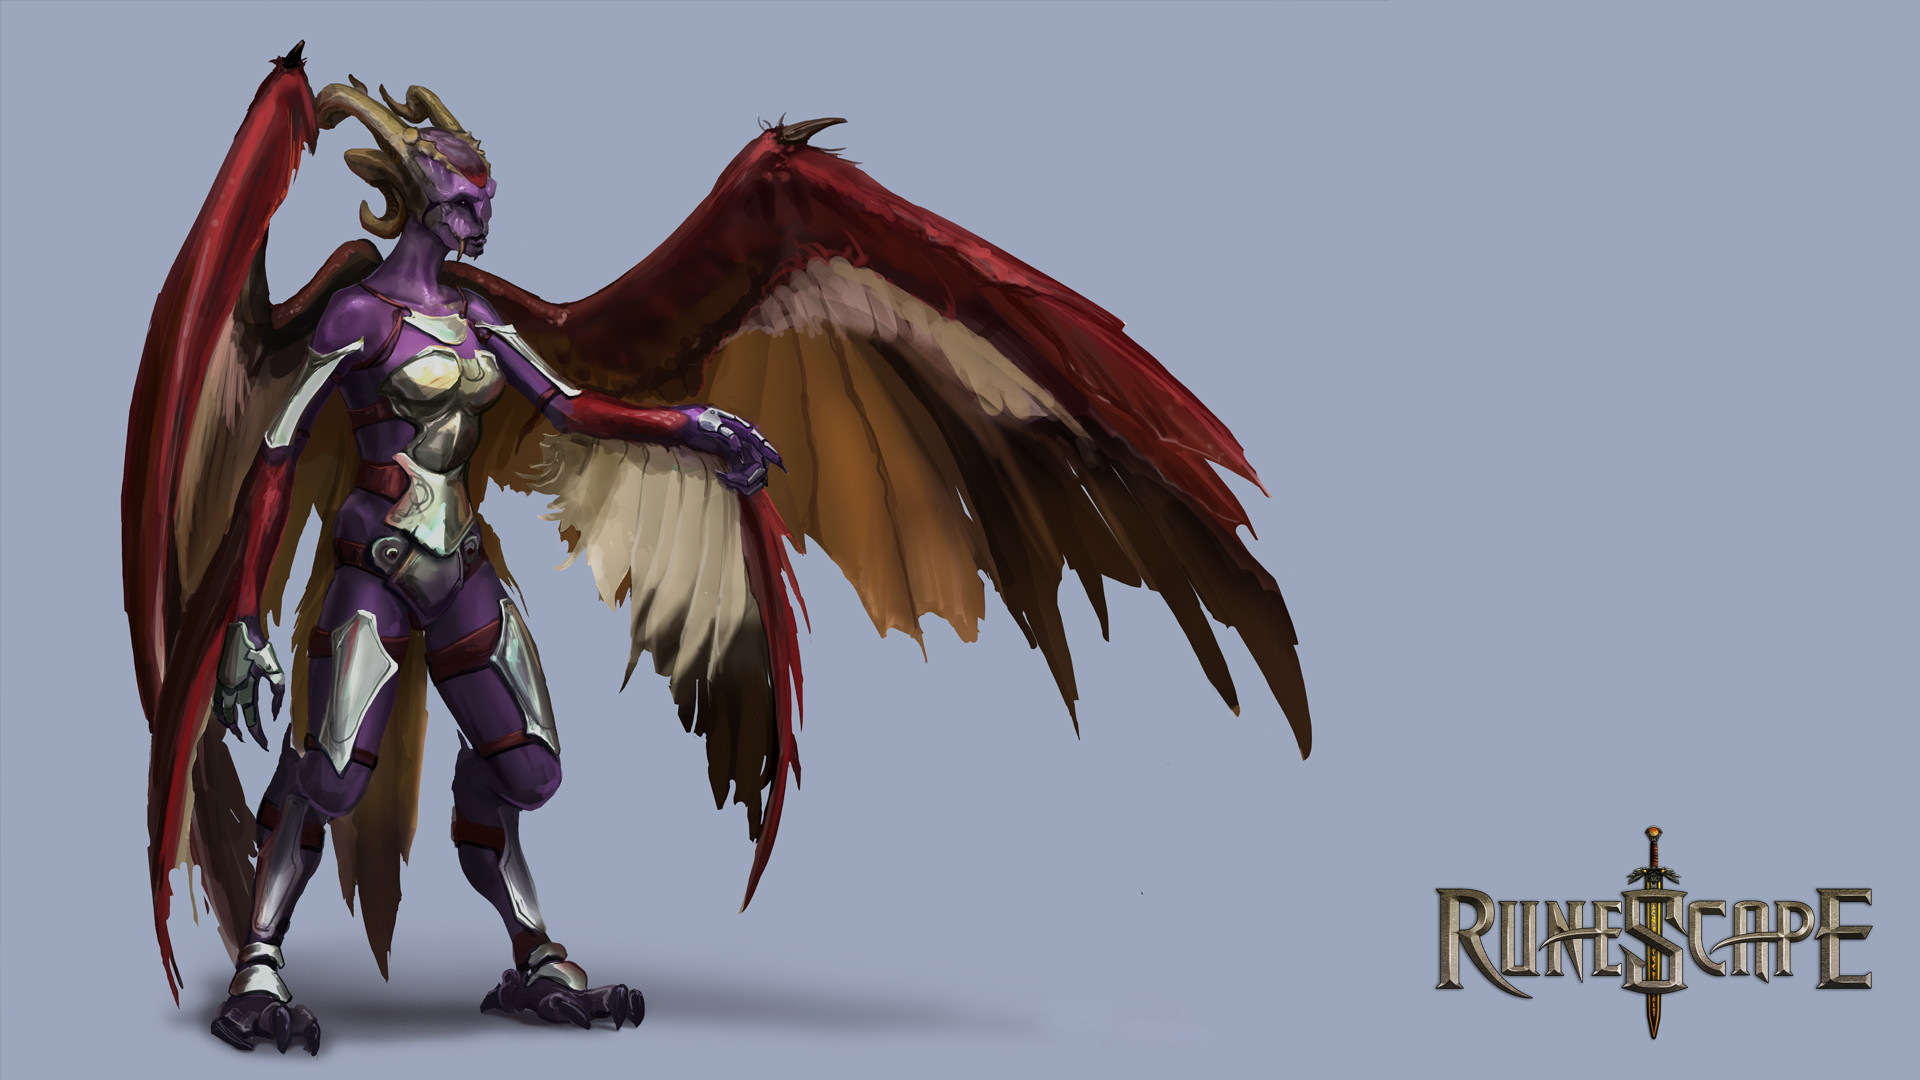 RUNESCAPE fantasy adventure monster demon dark wallpaper | |  220614 | WallpaperUP